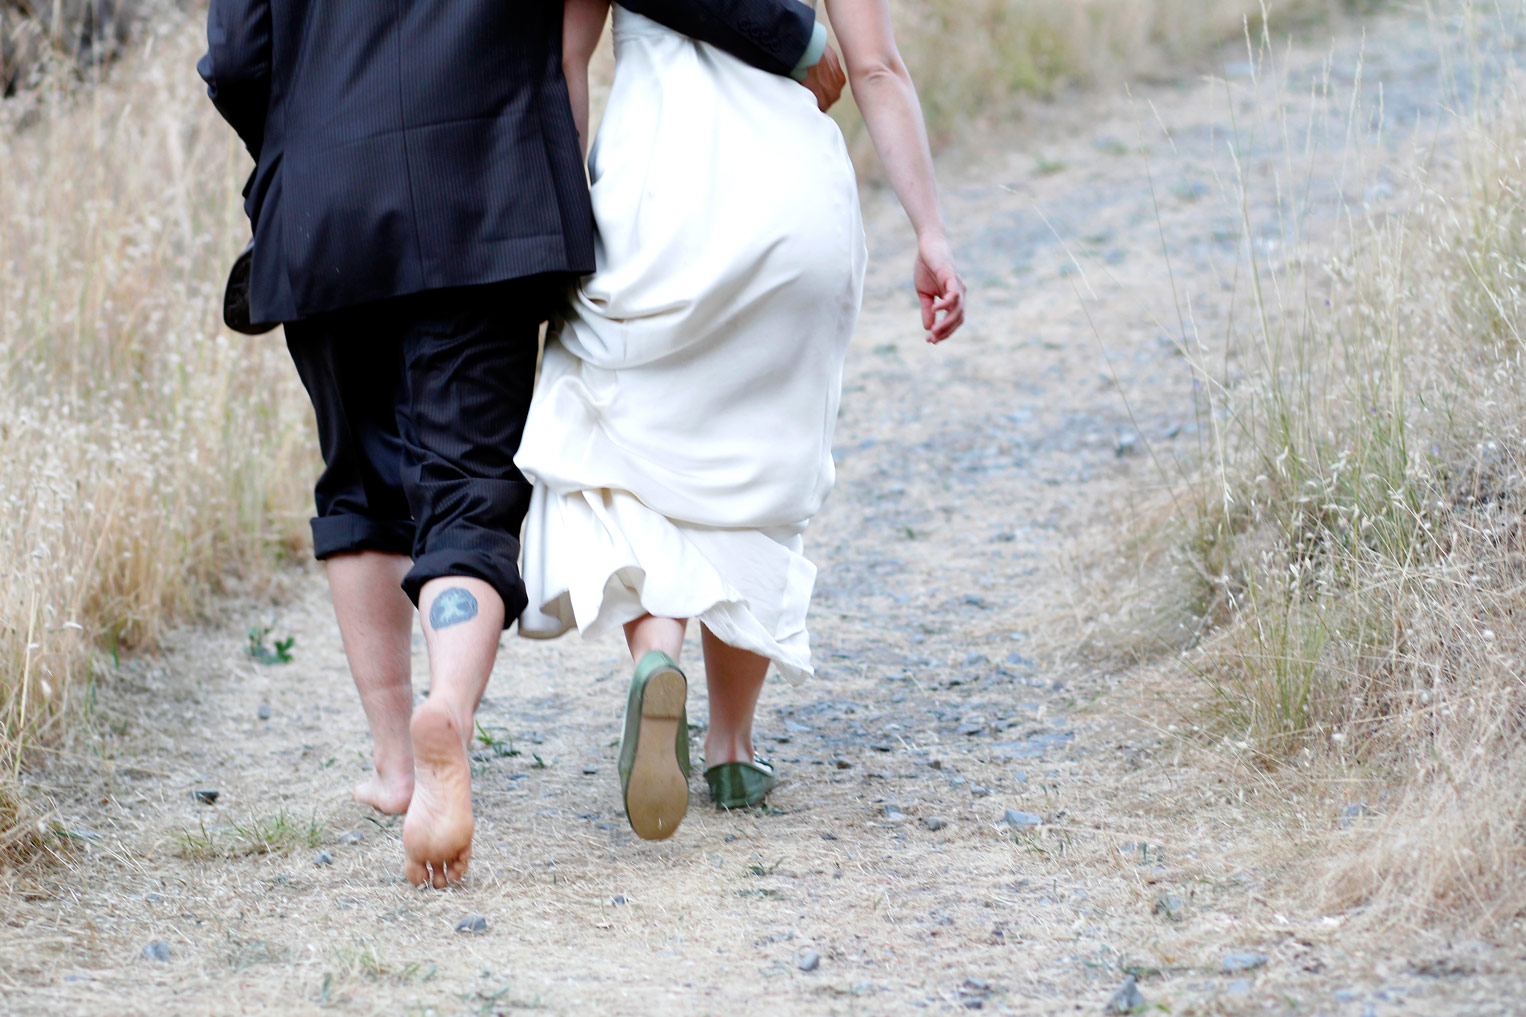 rustic-outdoor-trinity-river-wedding-ruthie-hauge-photography-43.jpg